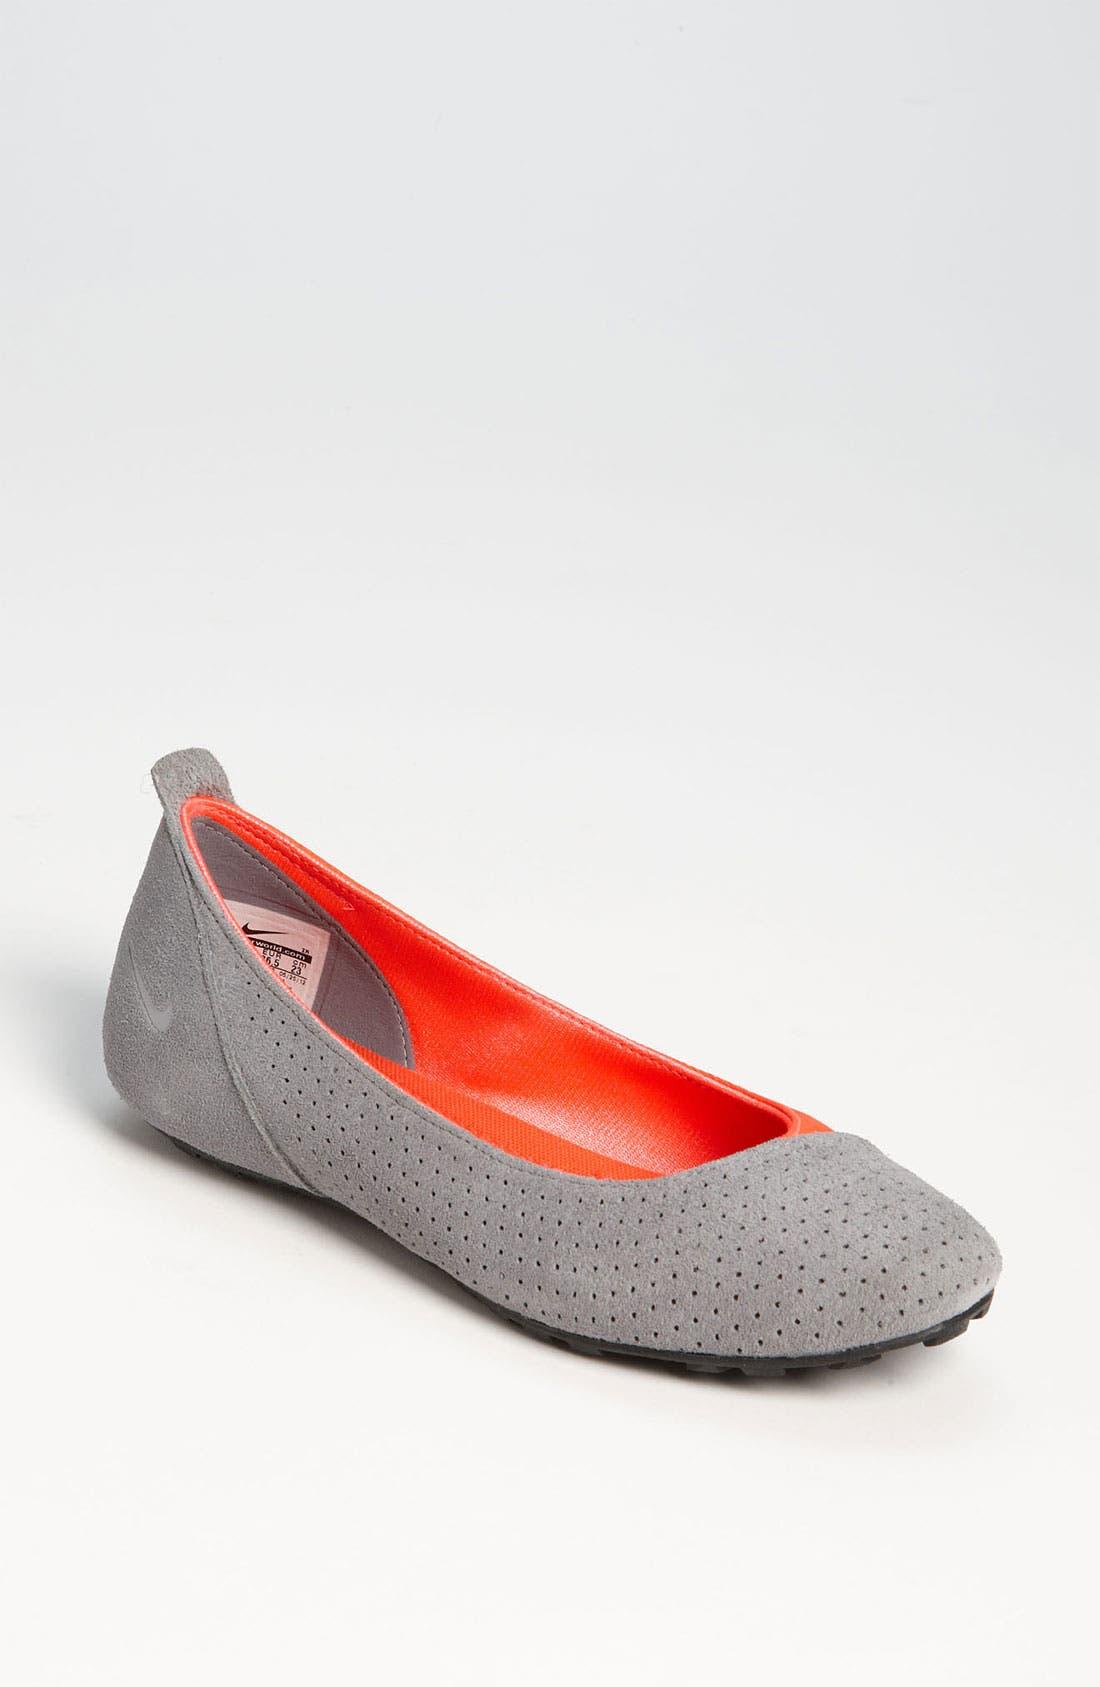 Alternate Image 1 Selected - Nike 'Amarina' Ballerina Flat